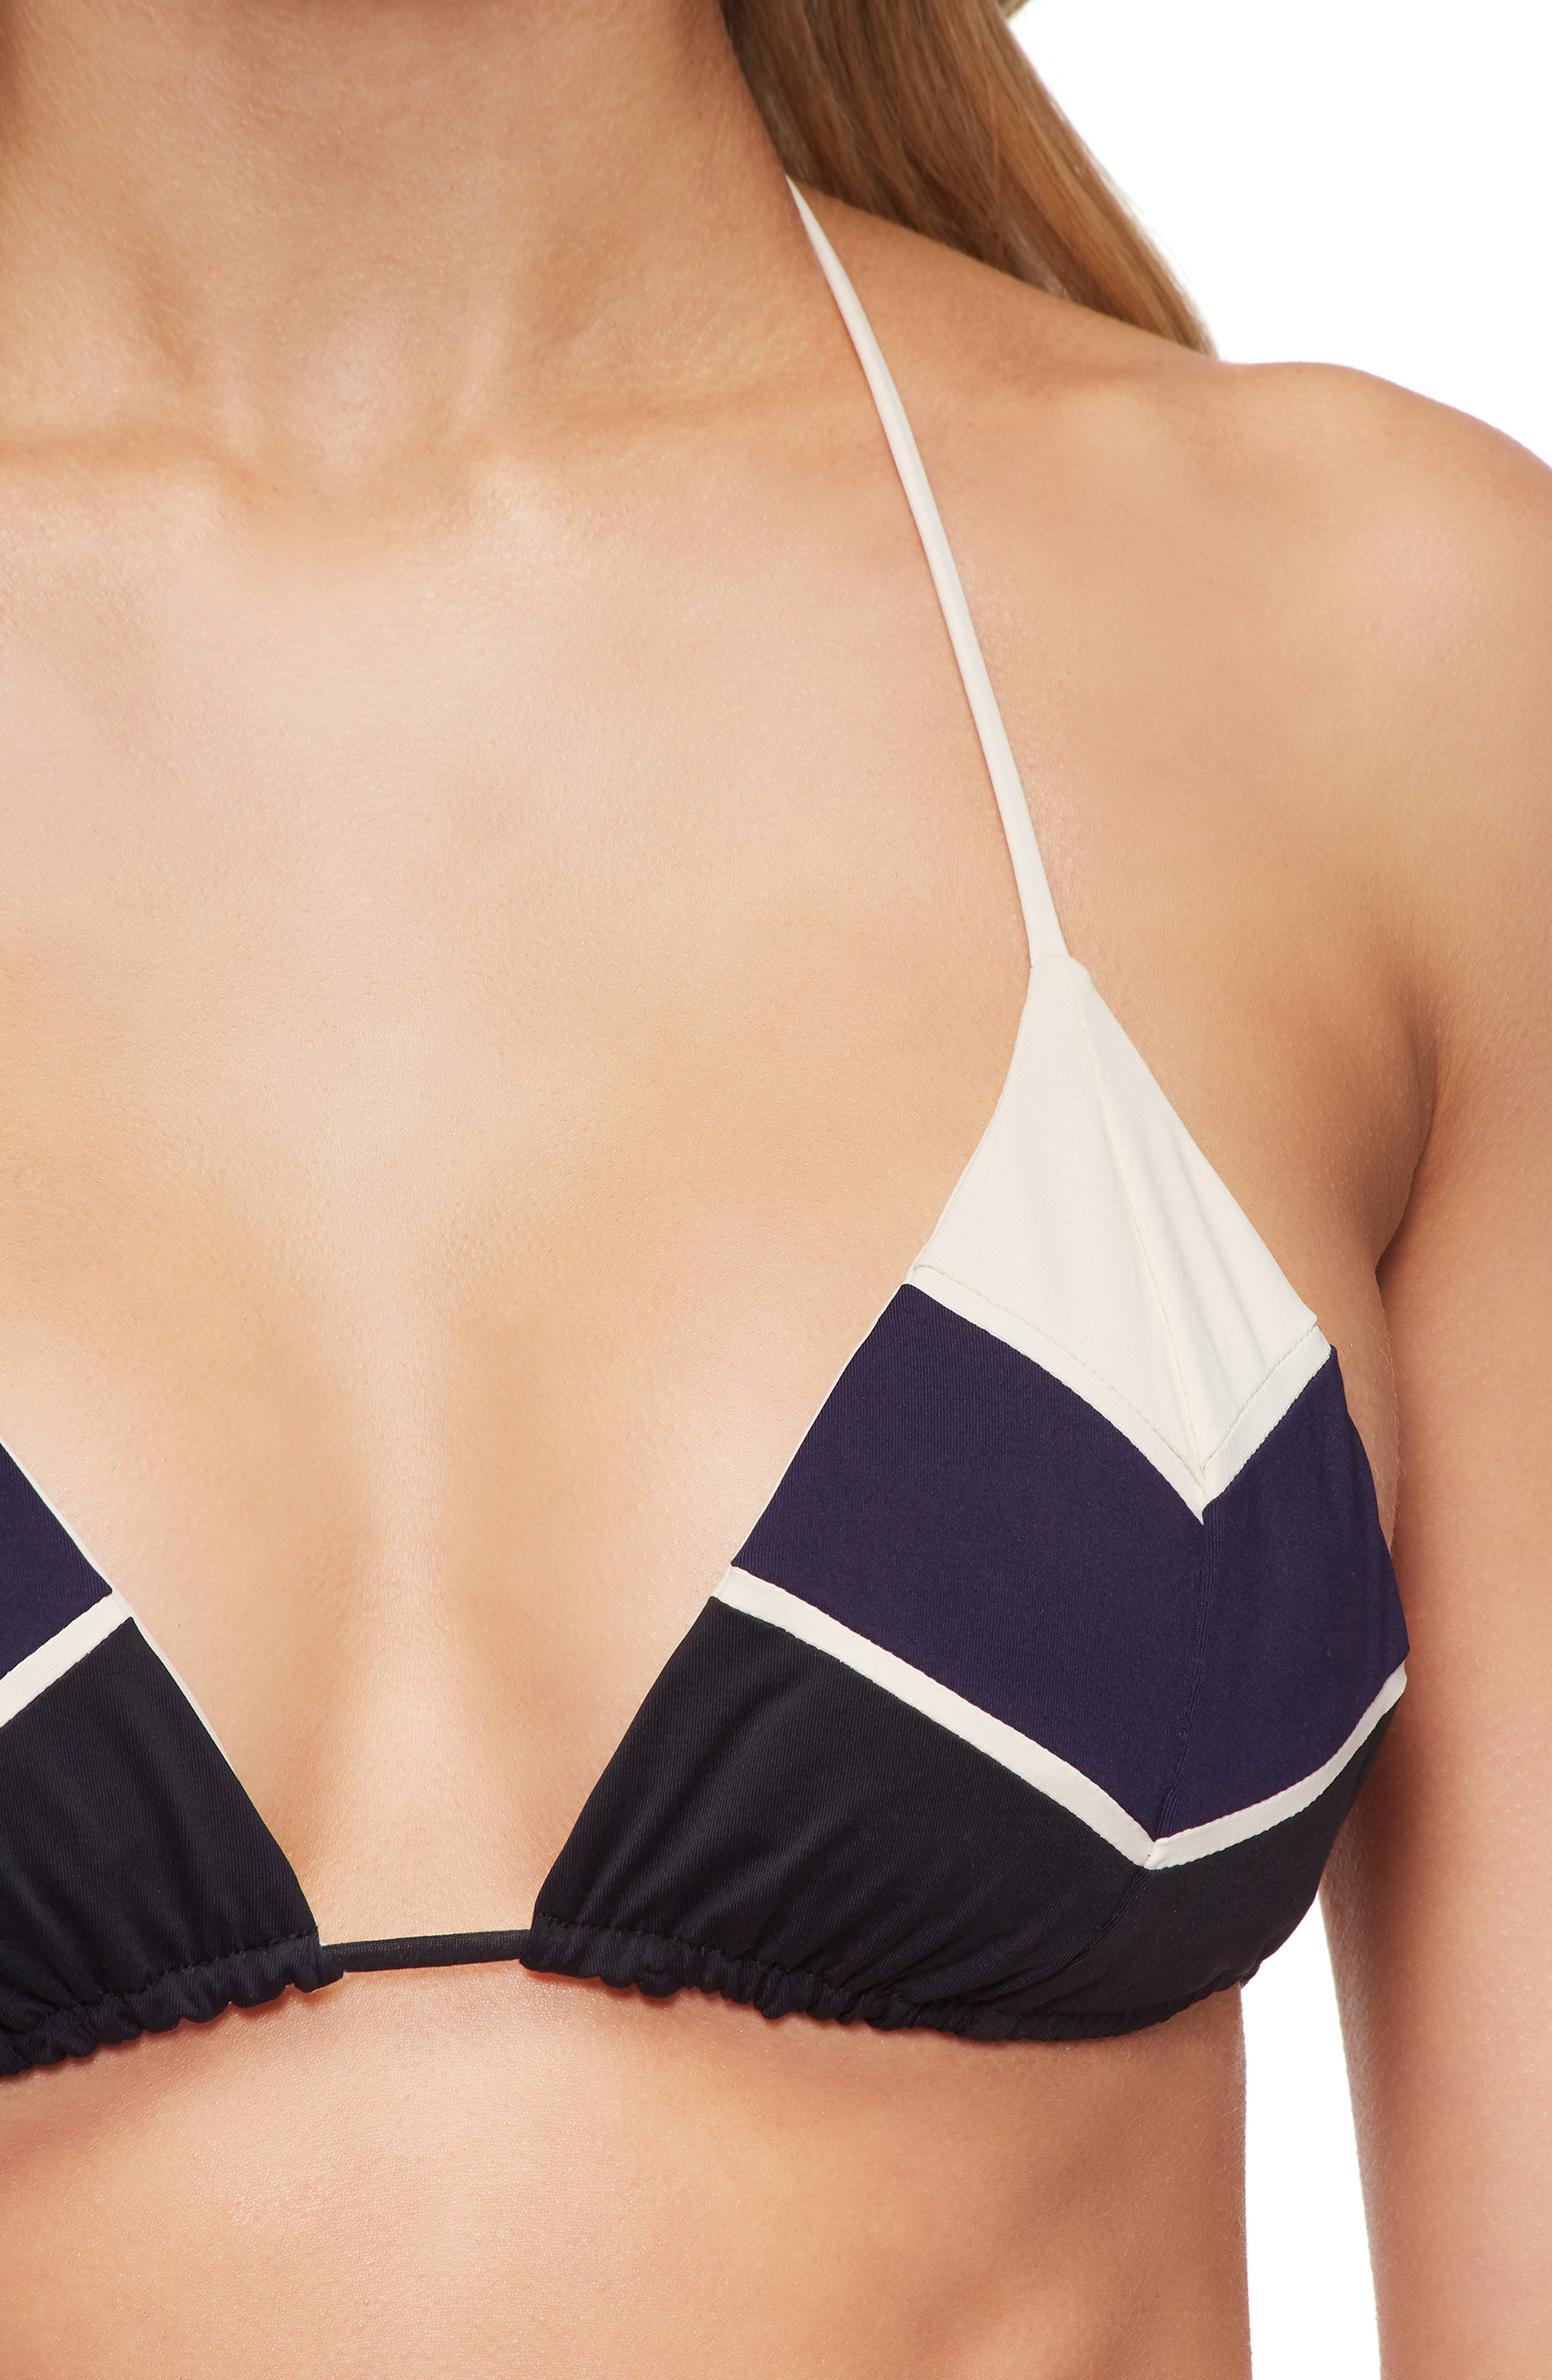 TAVIK, Swimwear Lea Triangle Bikini Top, Alternate thumbnail 4, color, TAPIOCA/EVENING BLUE